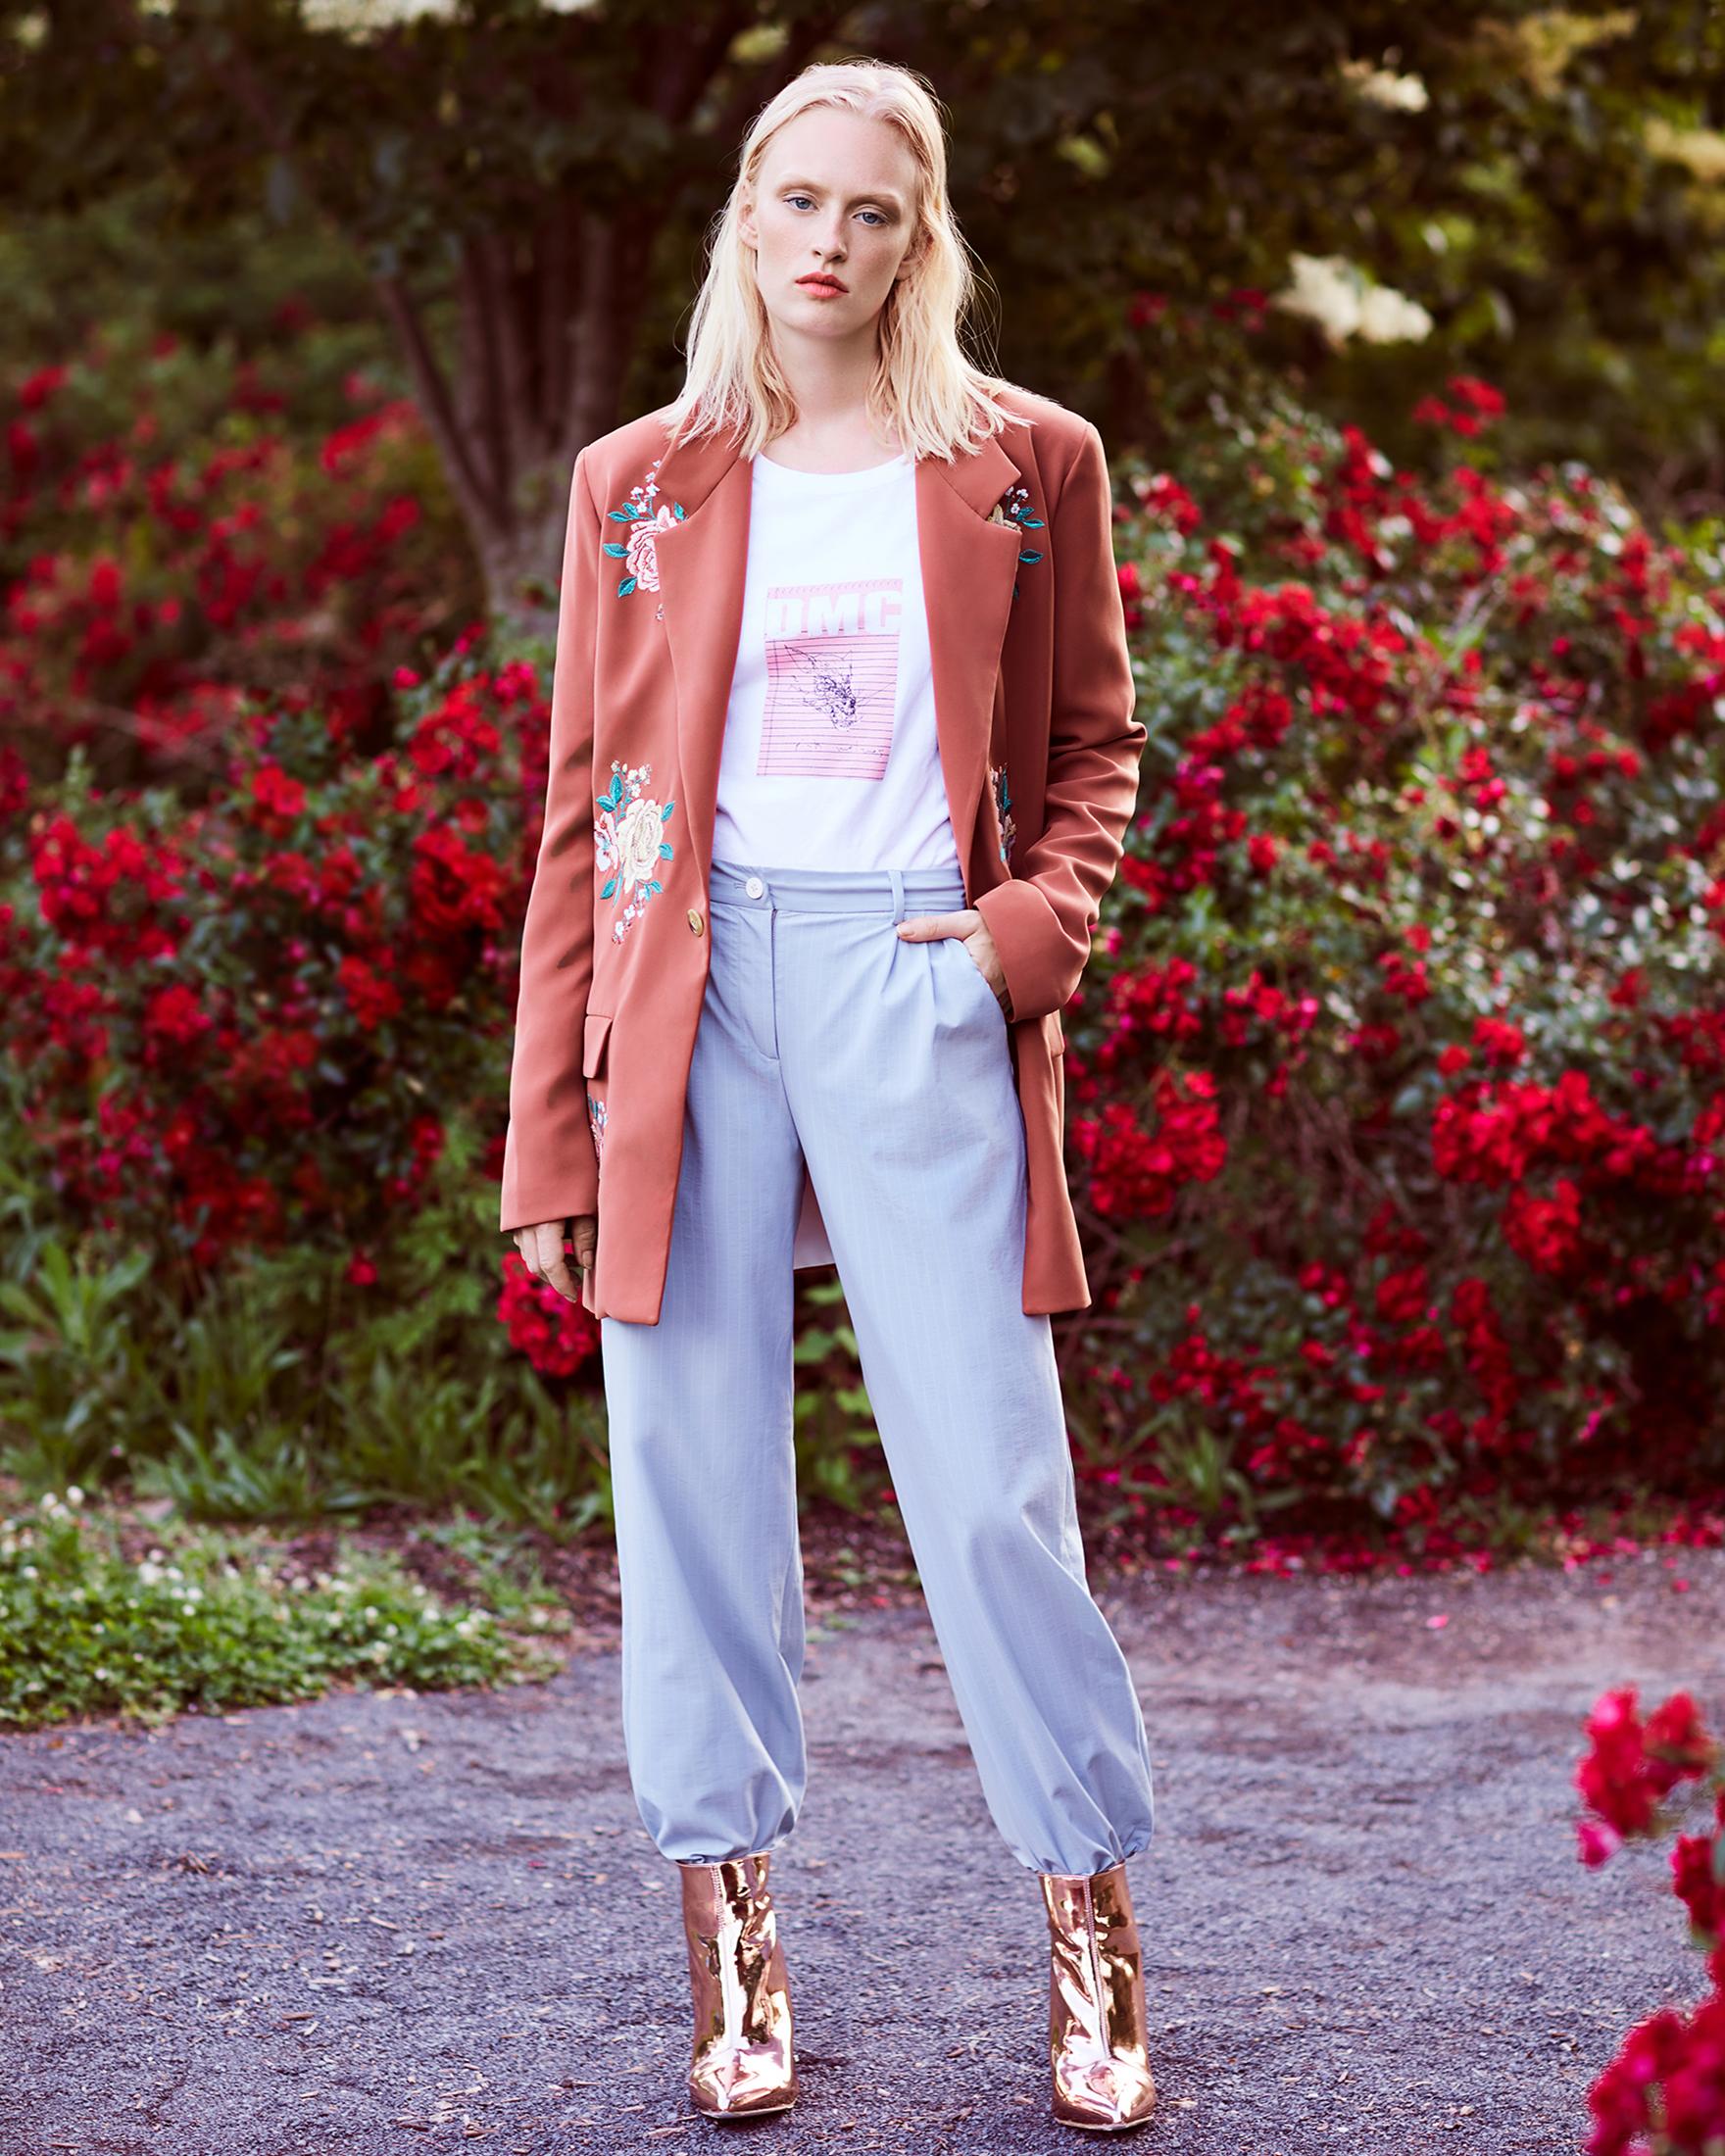 FashionPhotographer_FashionEditorial_By_BriJohnson_00010080.jpg